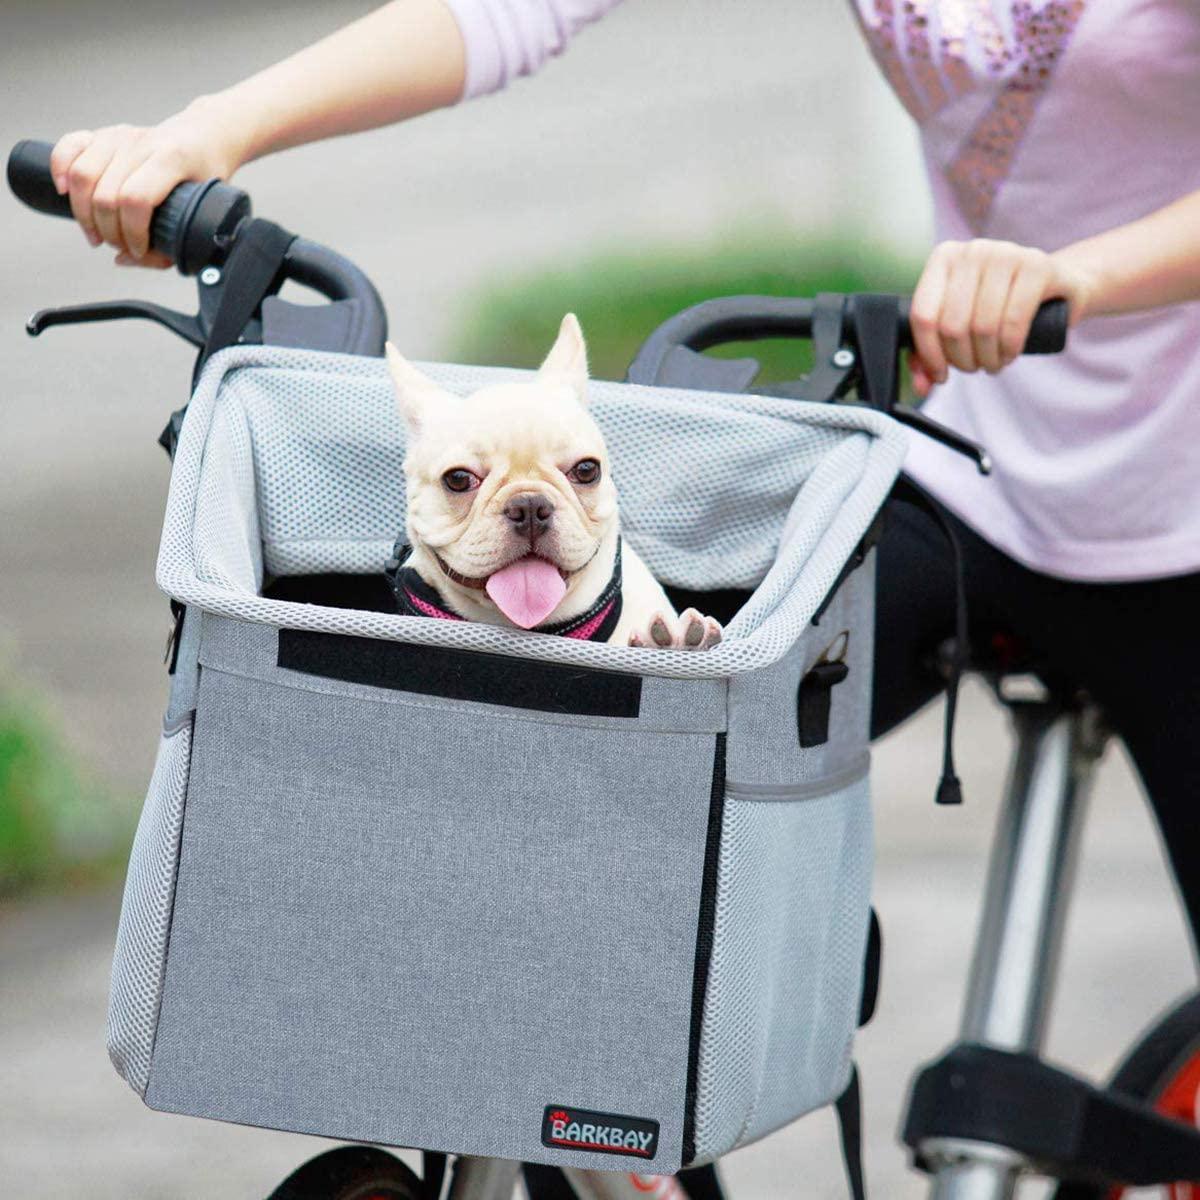 Best Bike Basket Carriers for Pets